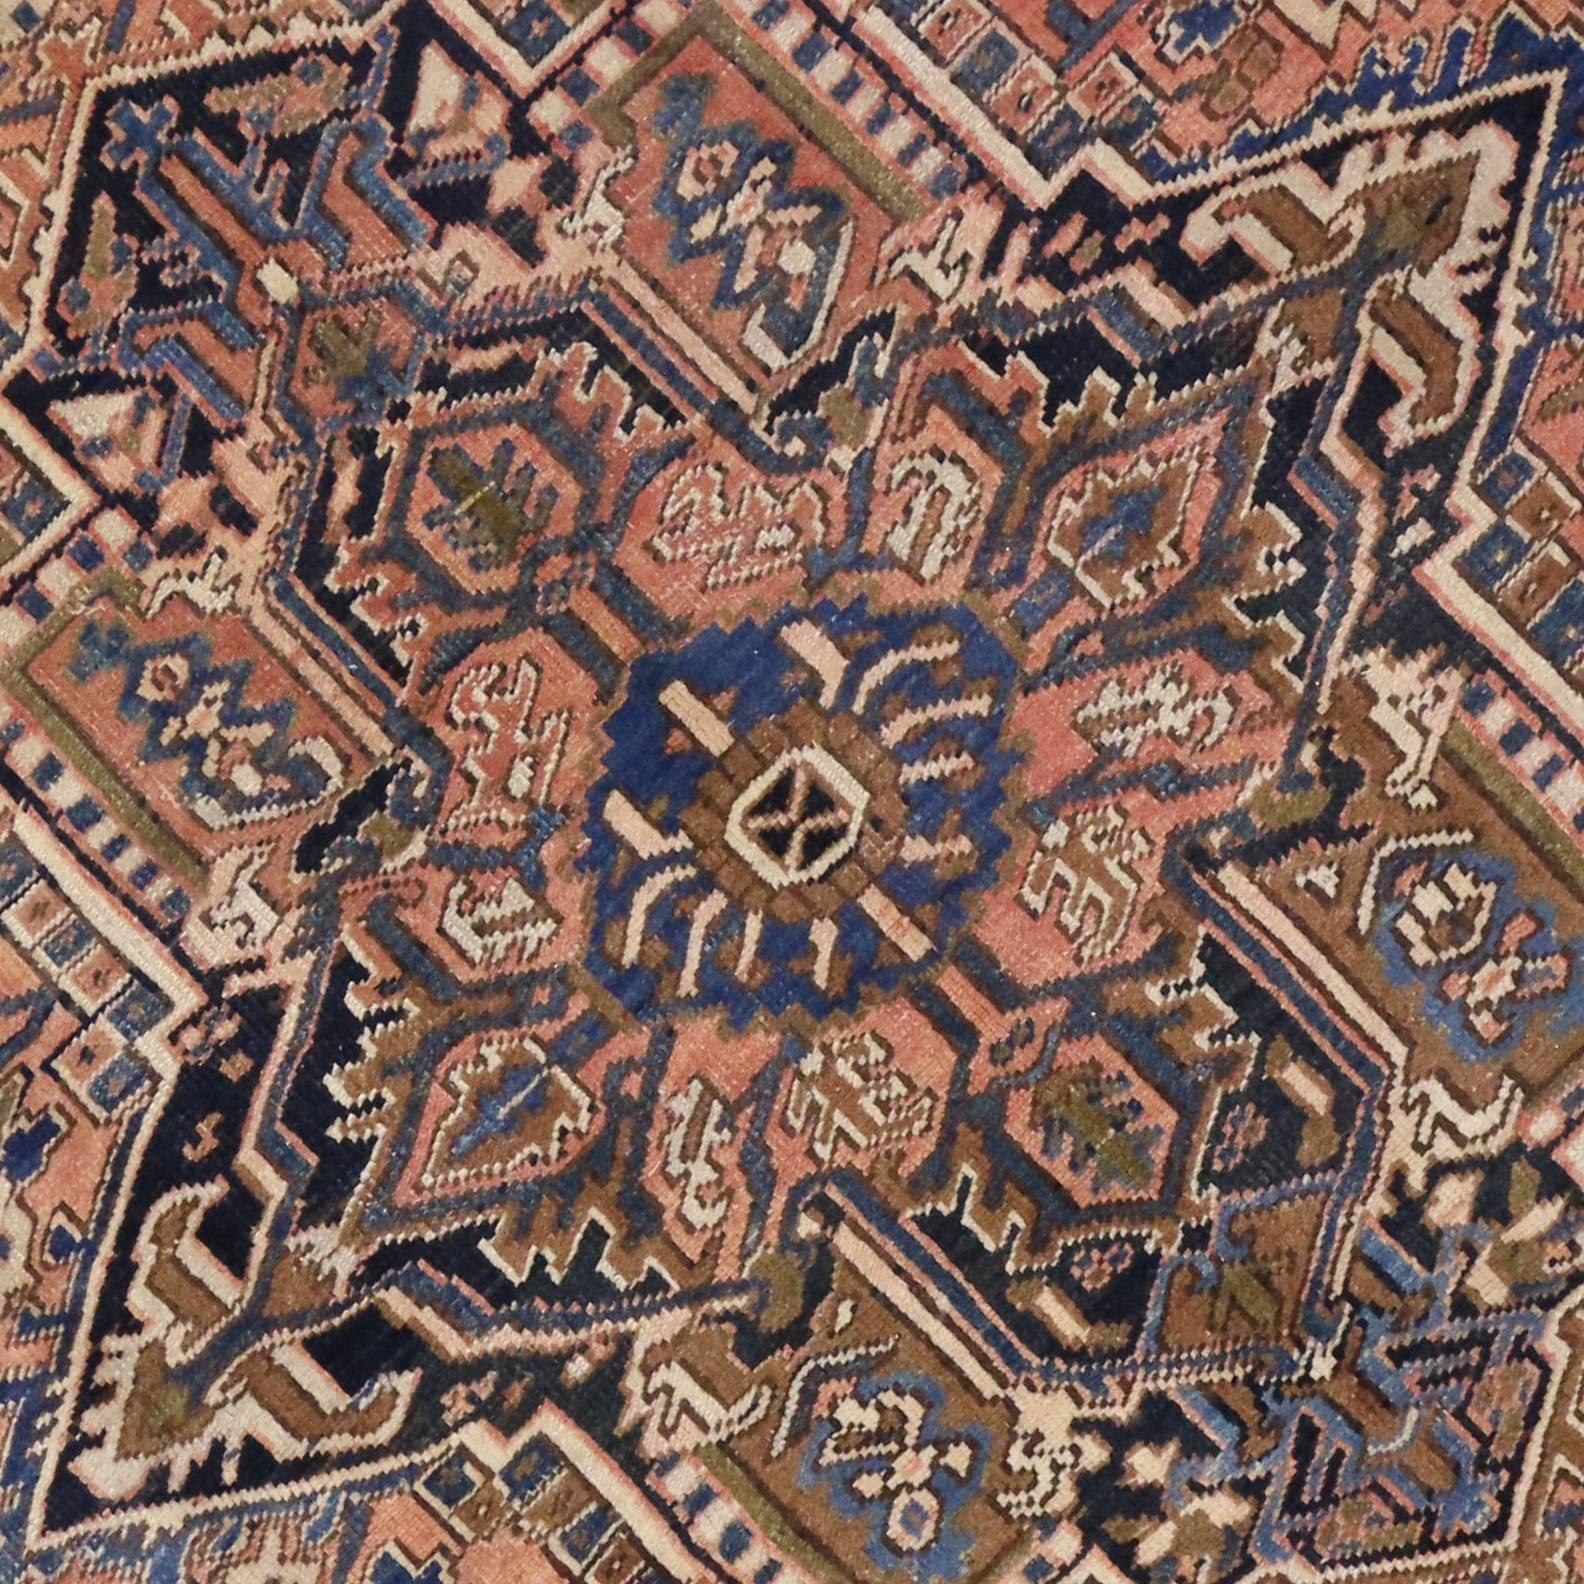 Vintage Persian Heriz Rug Light Colored Persian Rug For